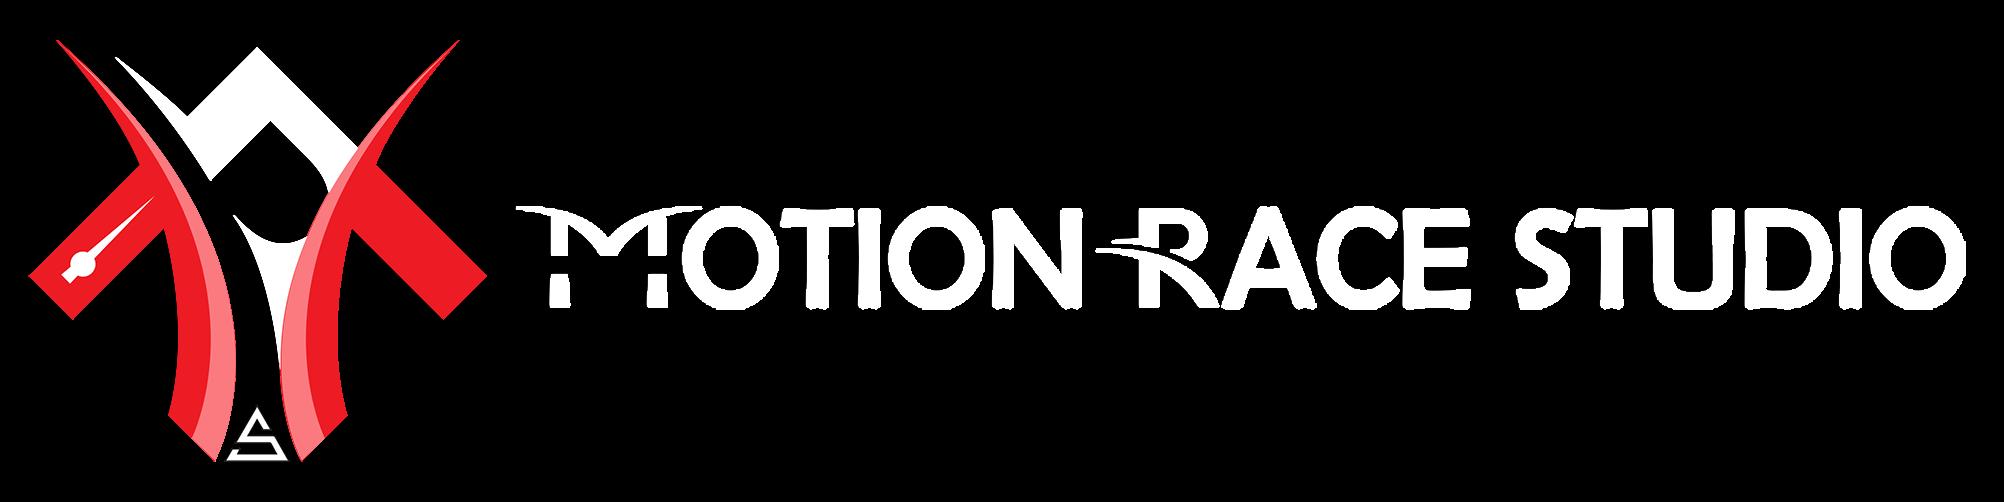 Motion Race Studio